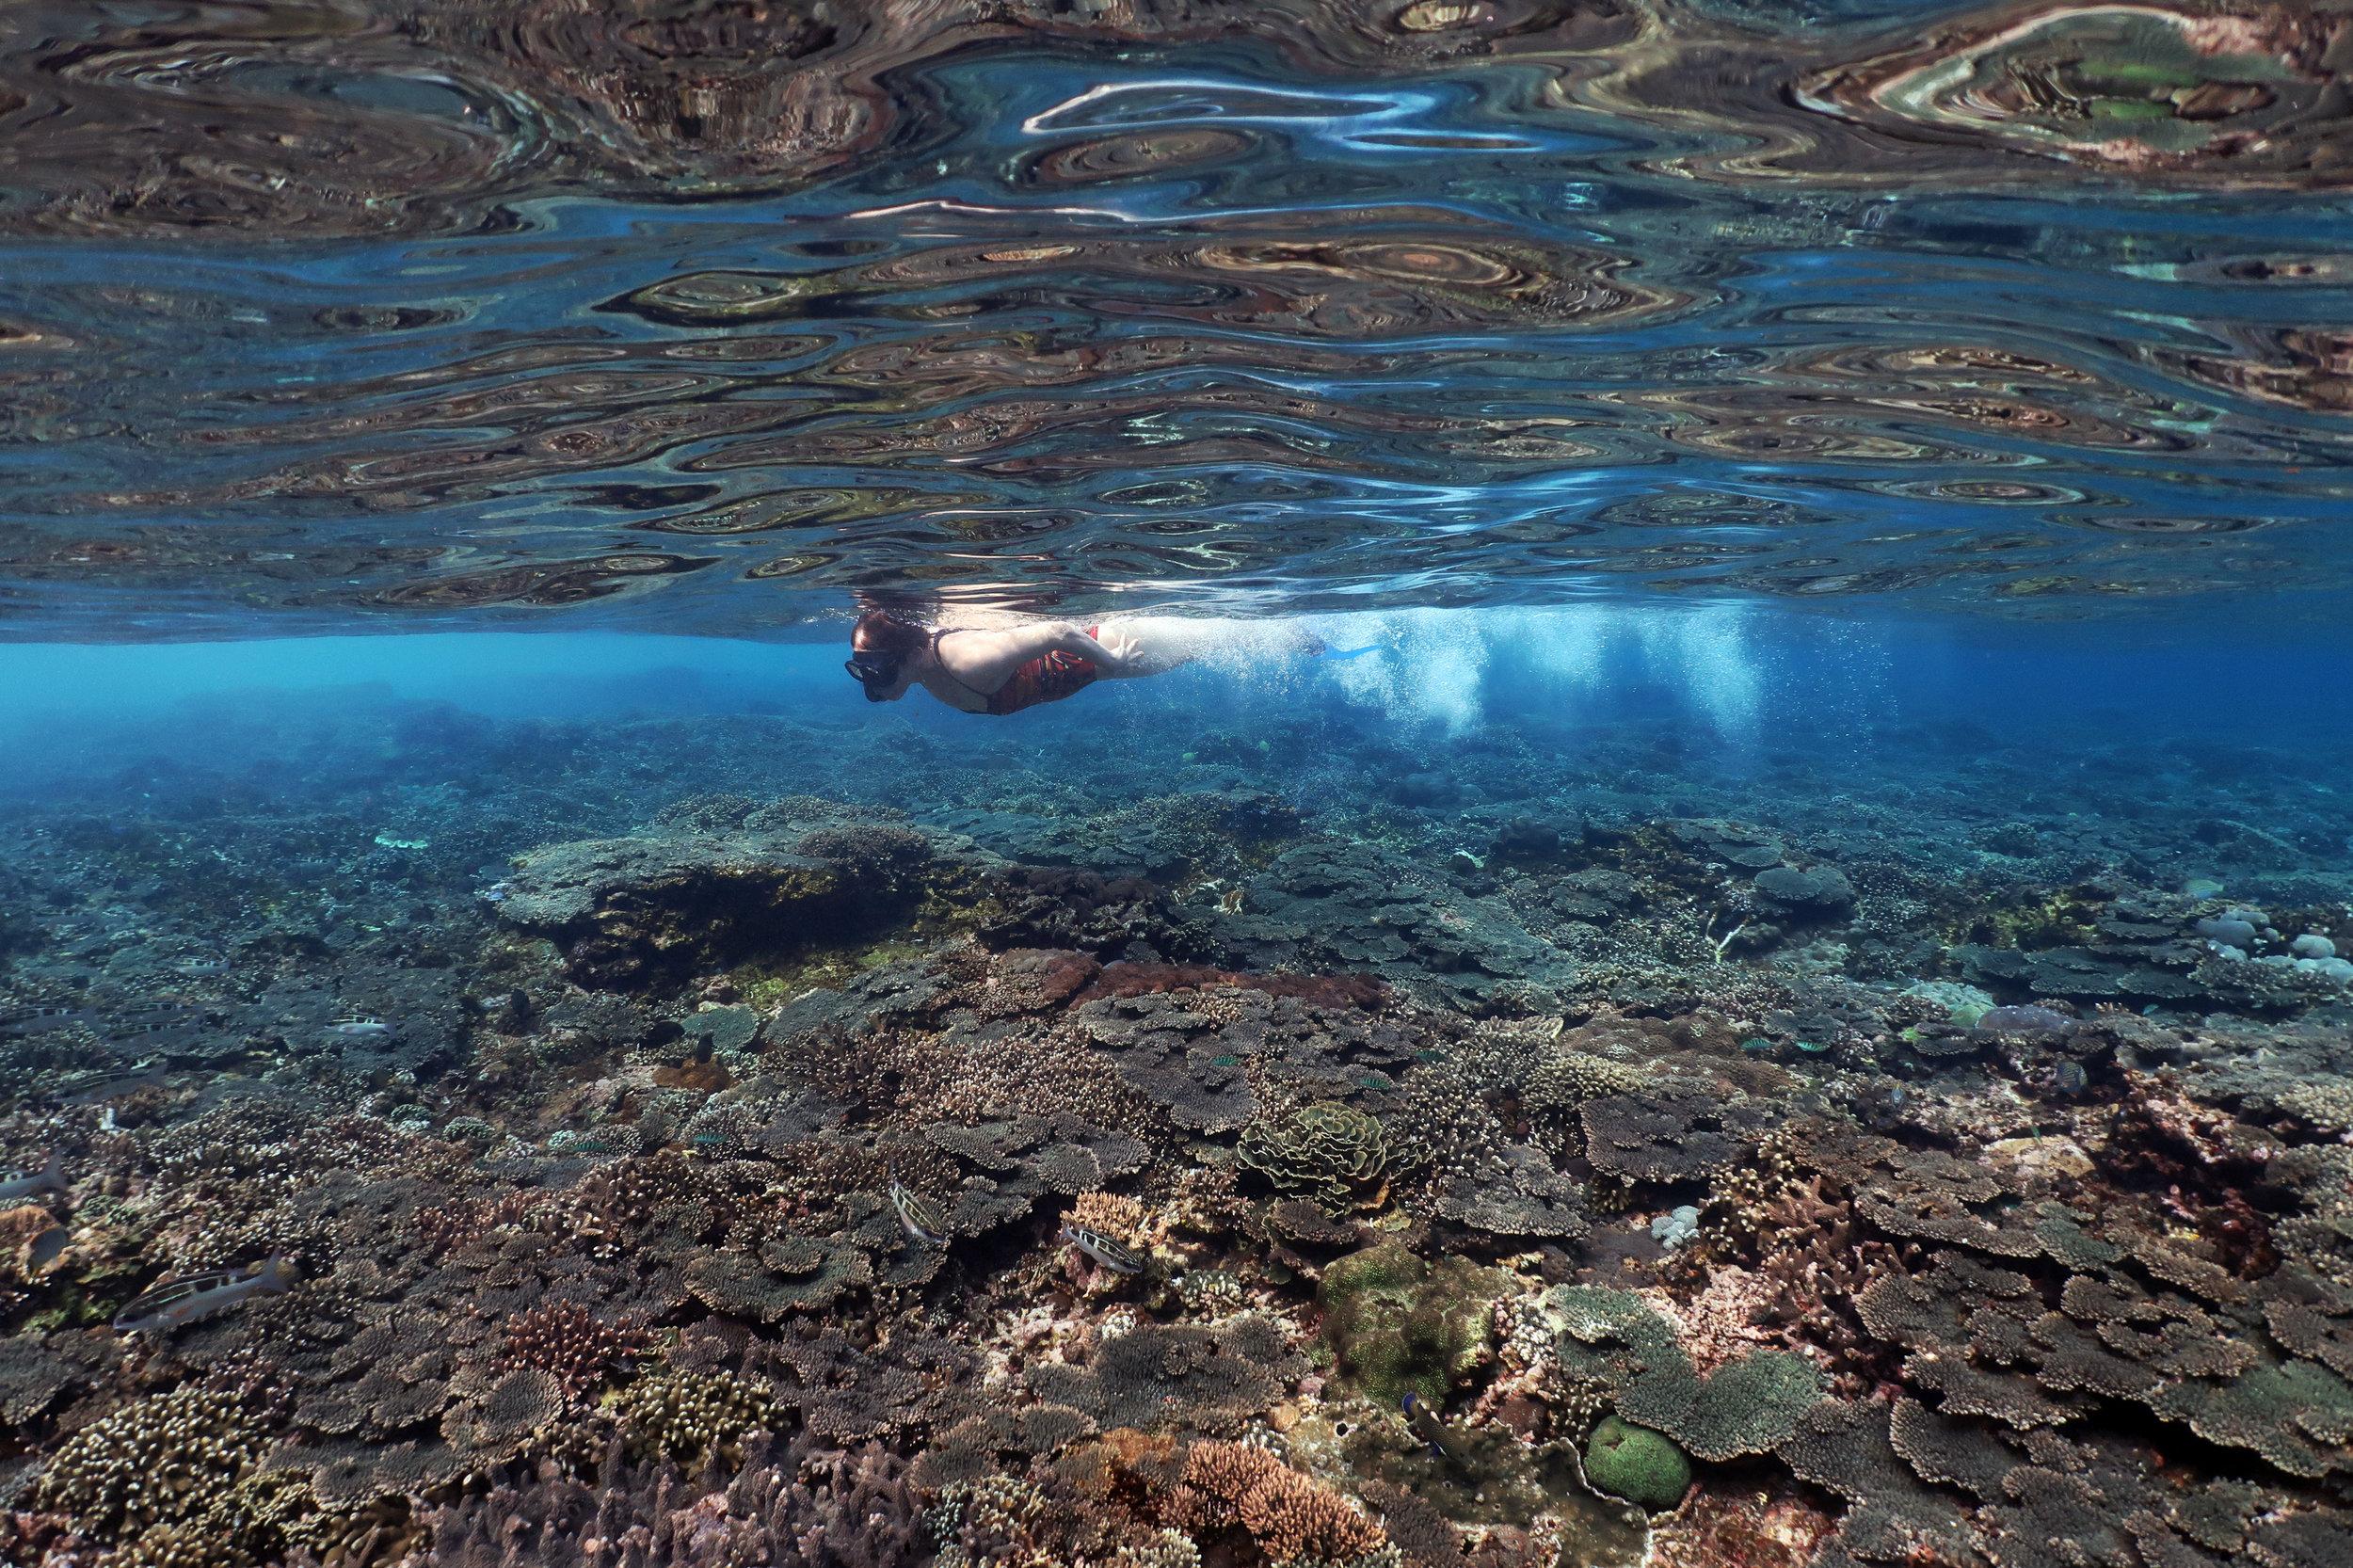 snorkler in nusa penida credit: Anett Szaszi / coral reef image bank